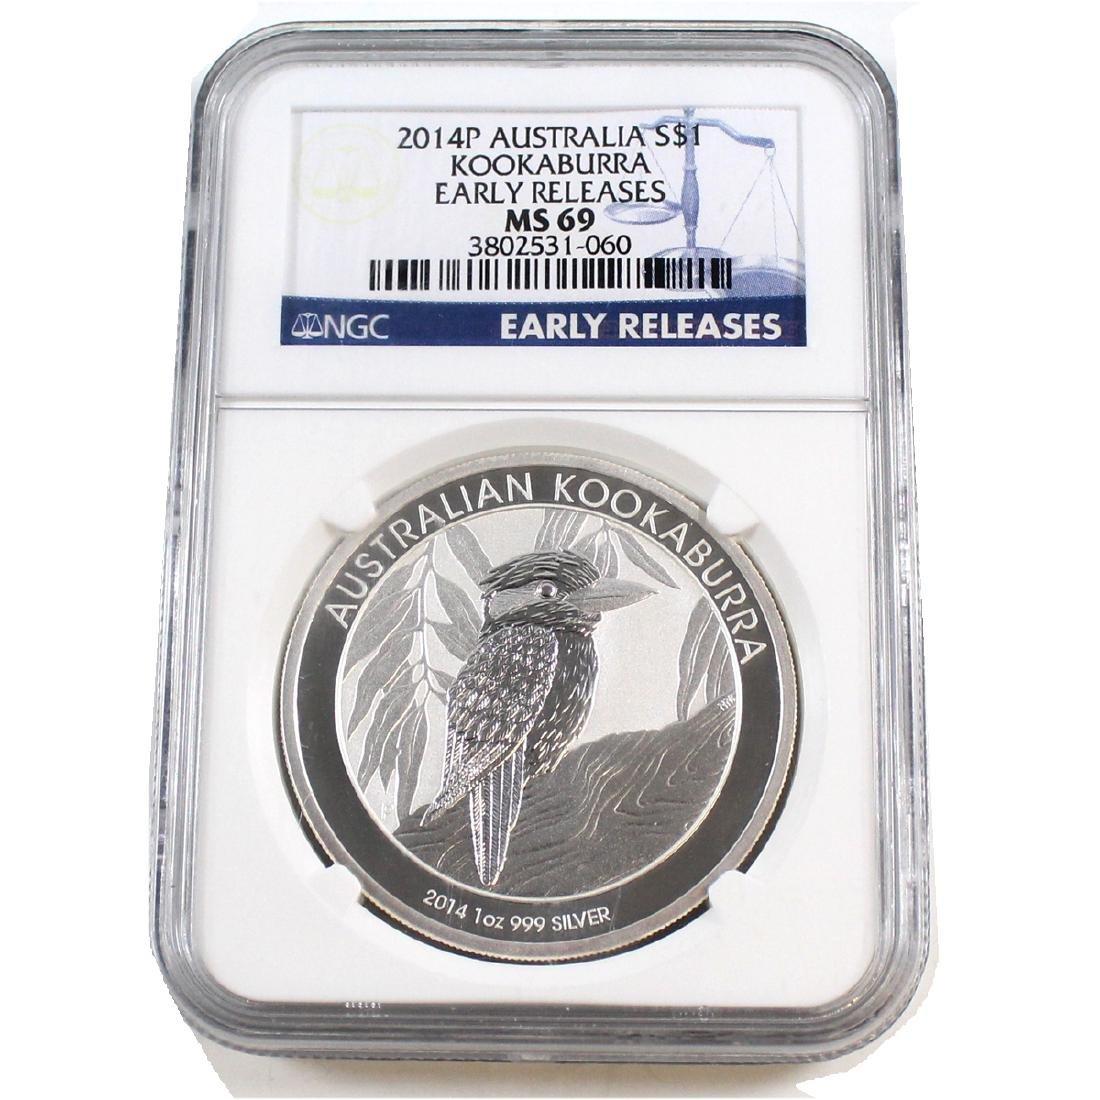 2014P Australia $1 Kookaburra NGC Certified MS-69;